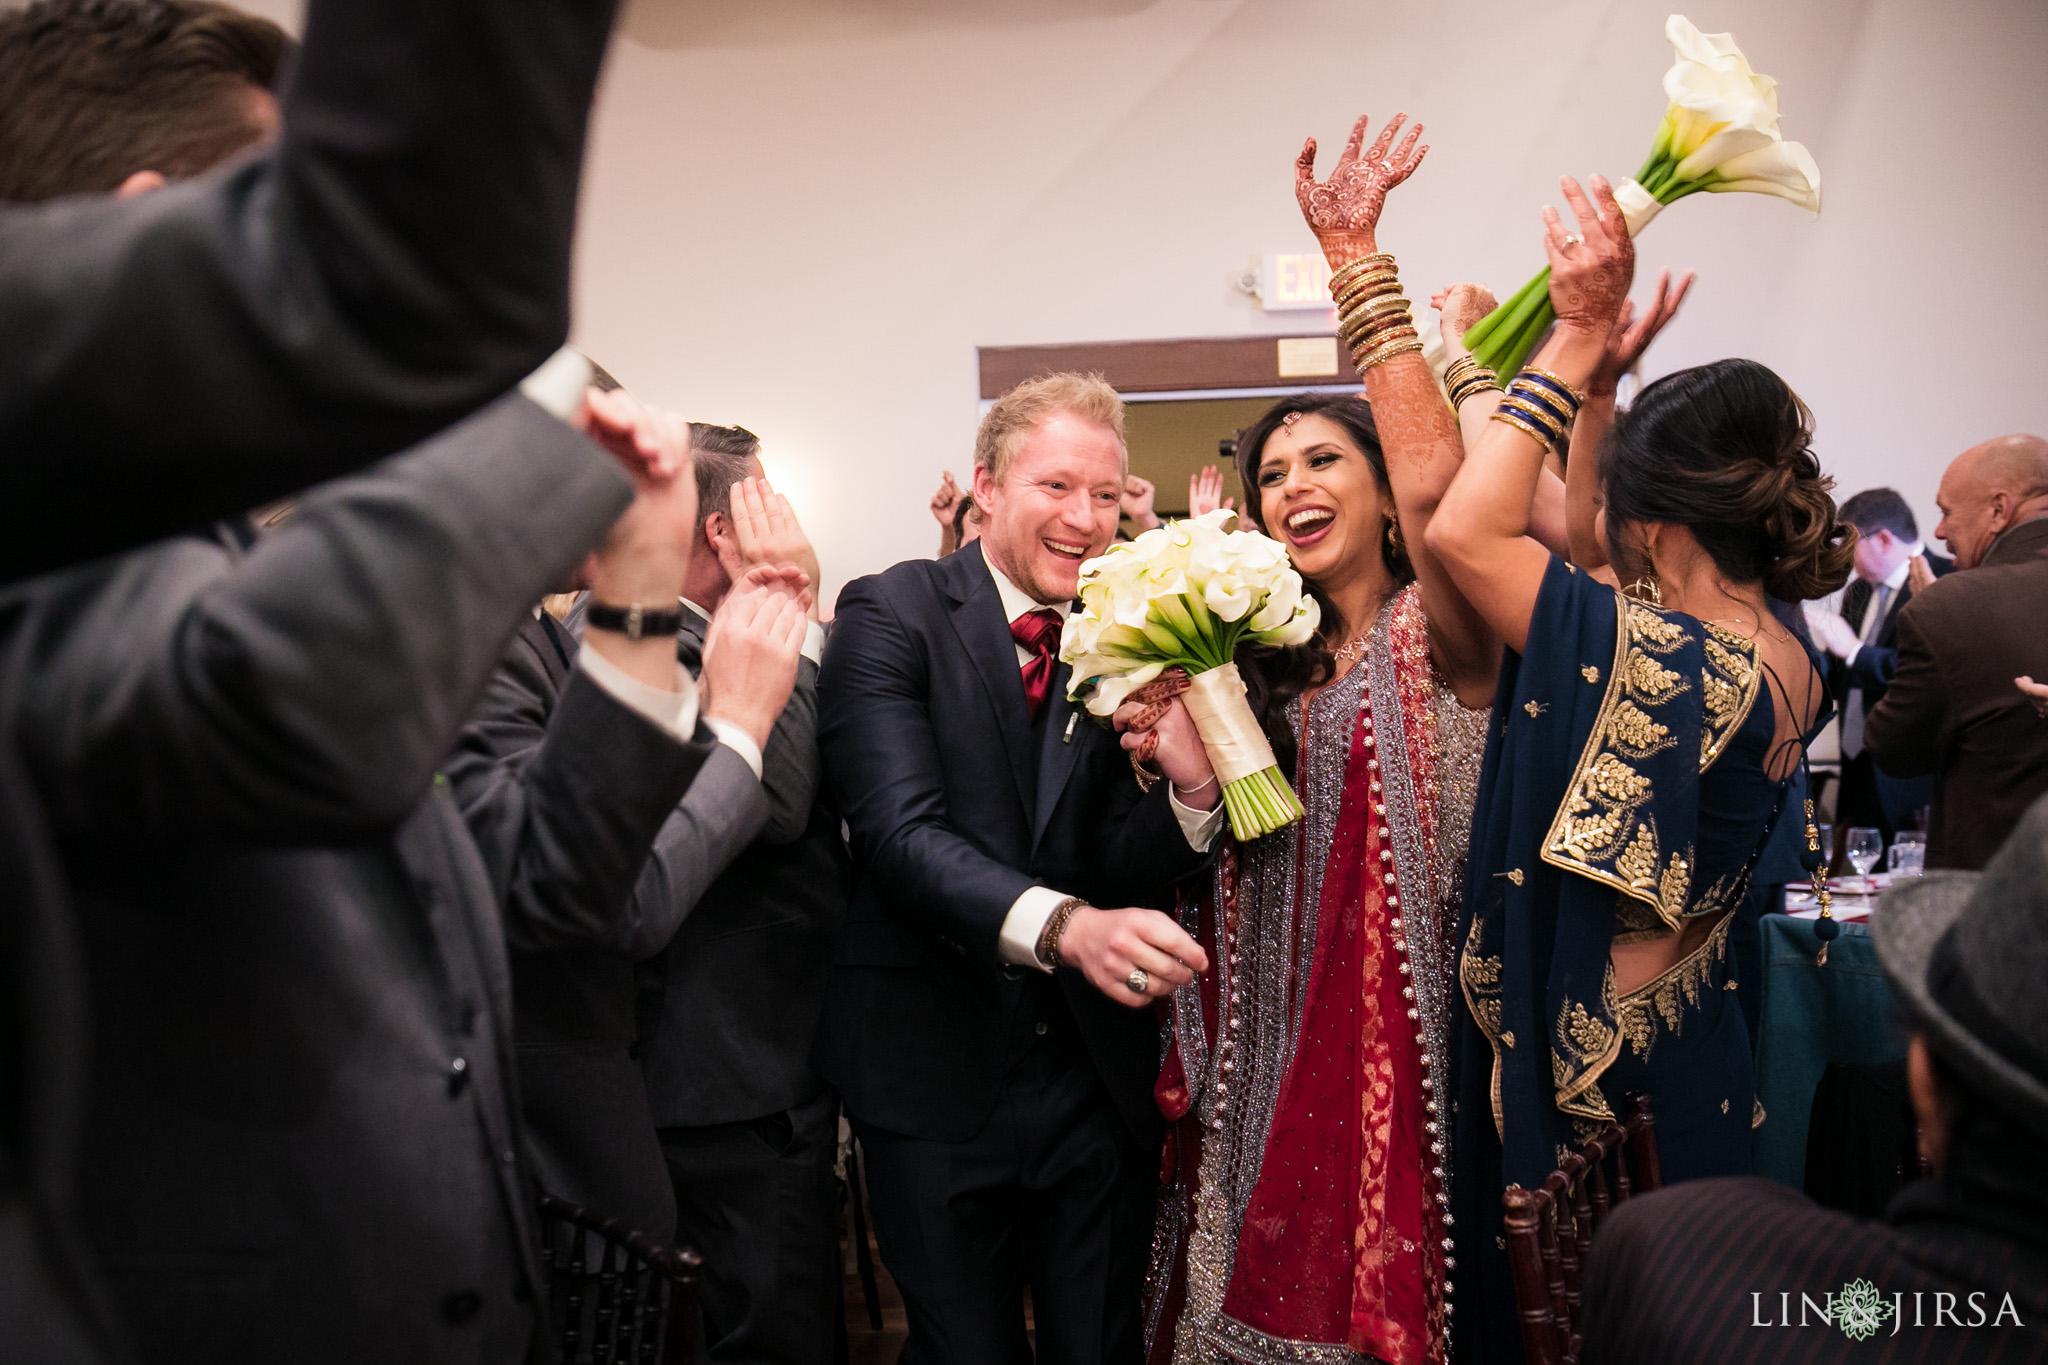 38 altadena town country club pakistani wedding reception photography